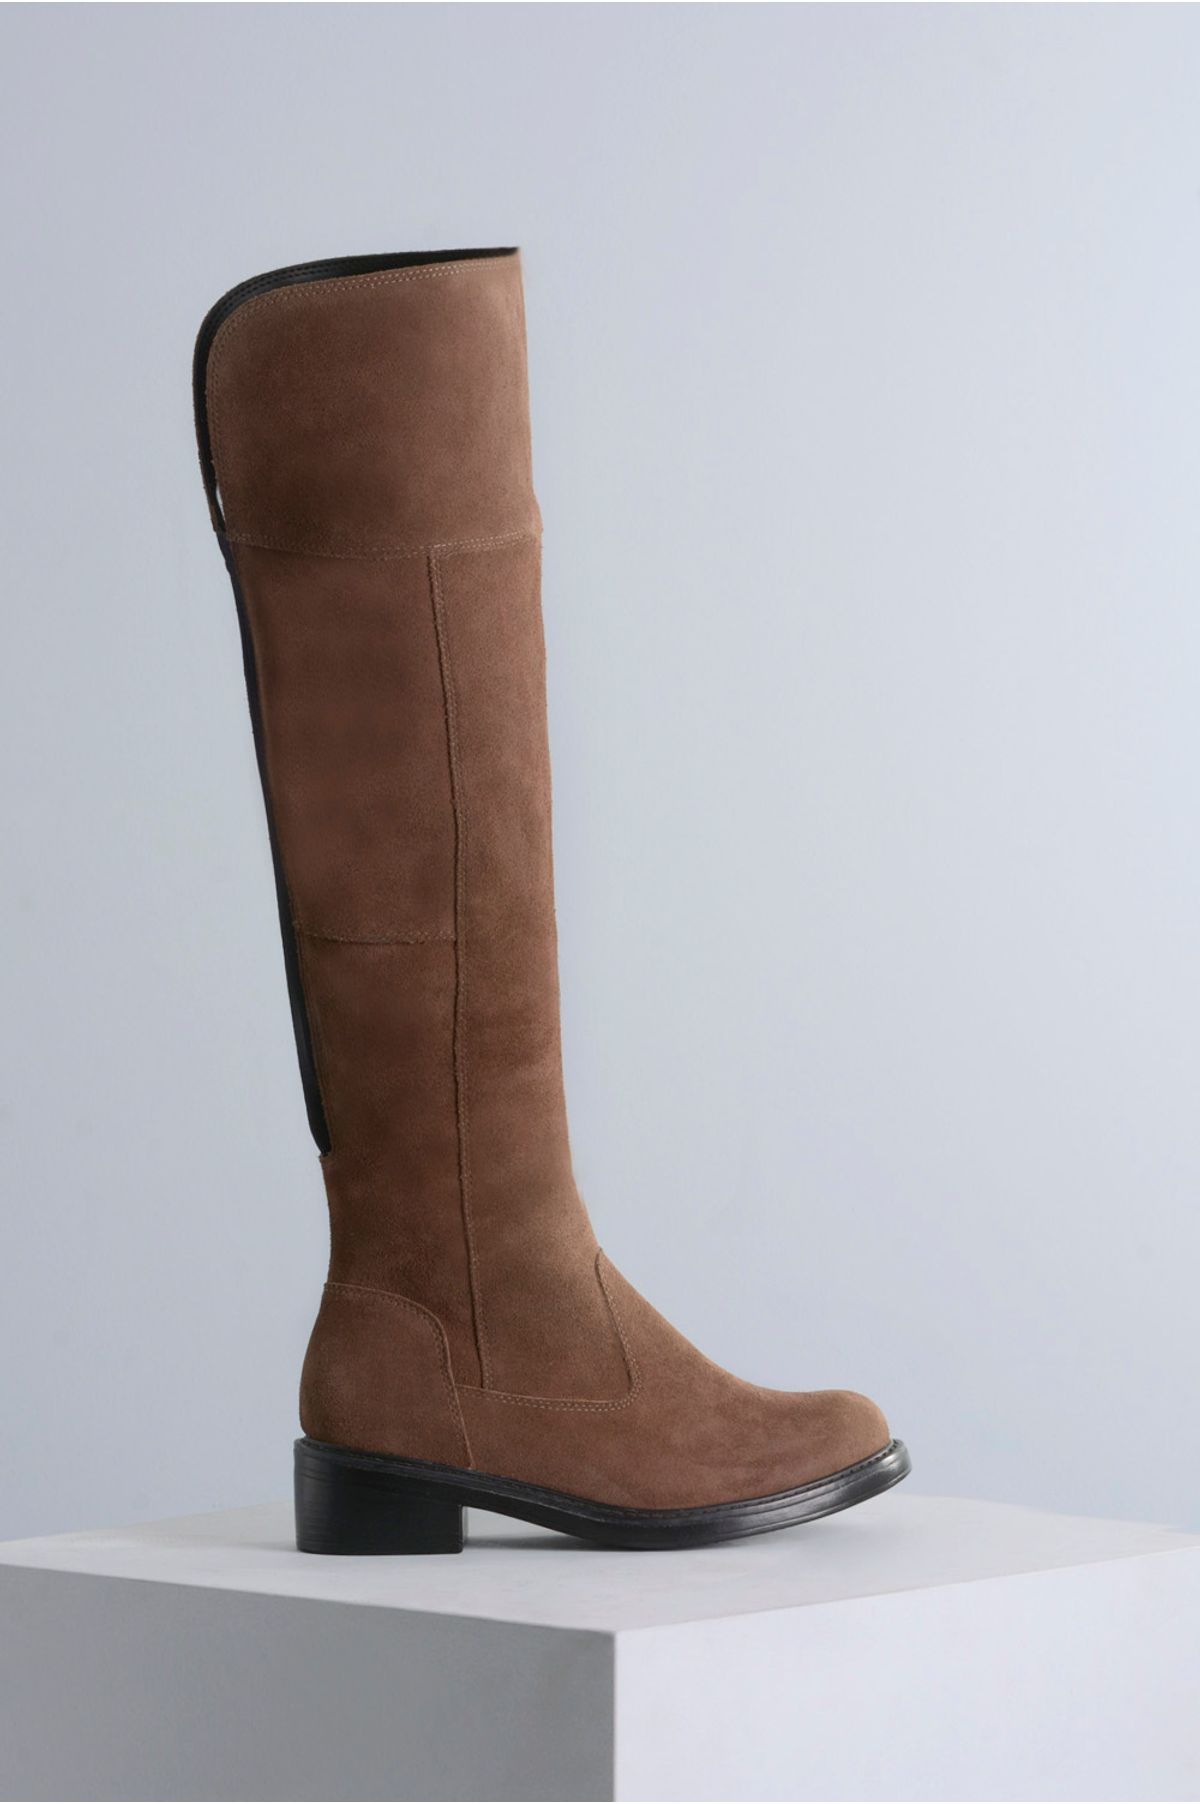 Bota Feminina Cano Longo Kailan Mundial CR-CINZA - Mundial Calçados 7f5bd68a6e